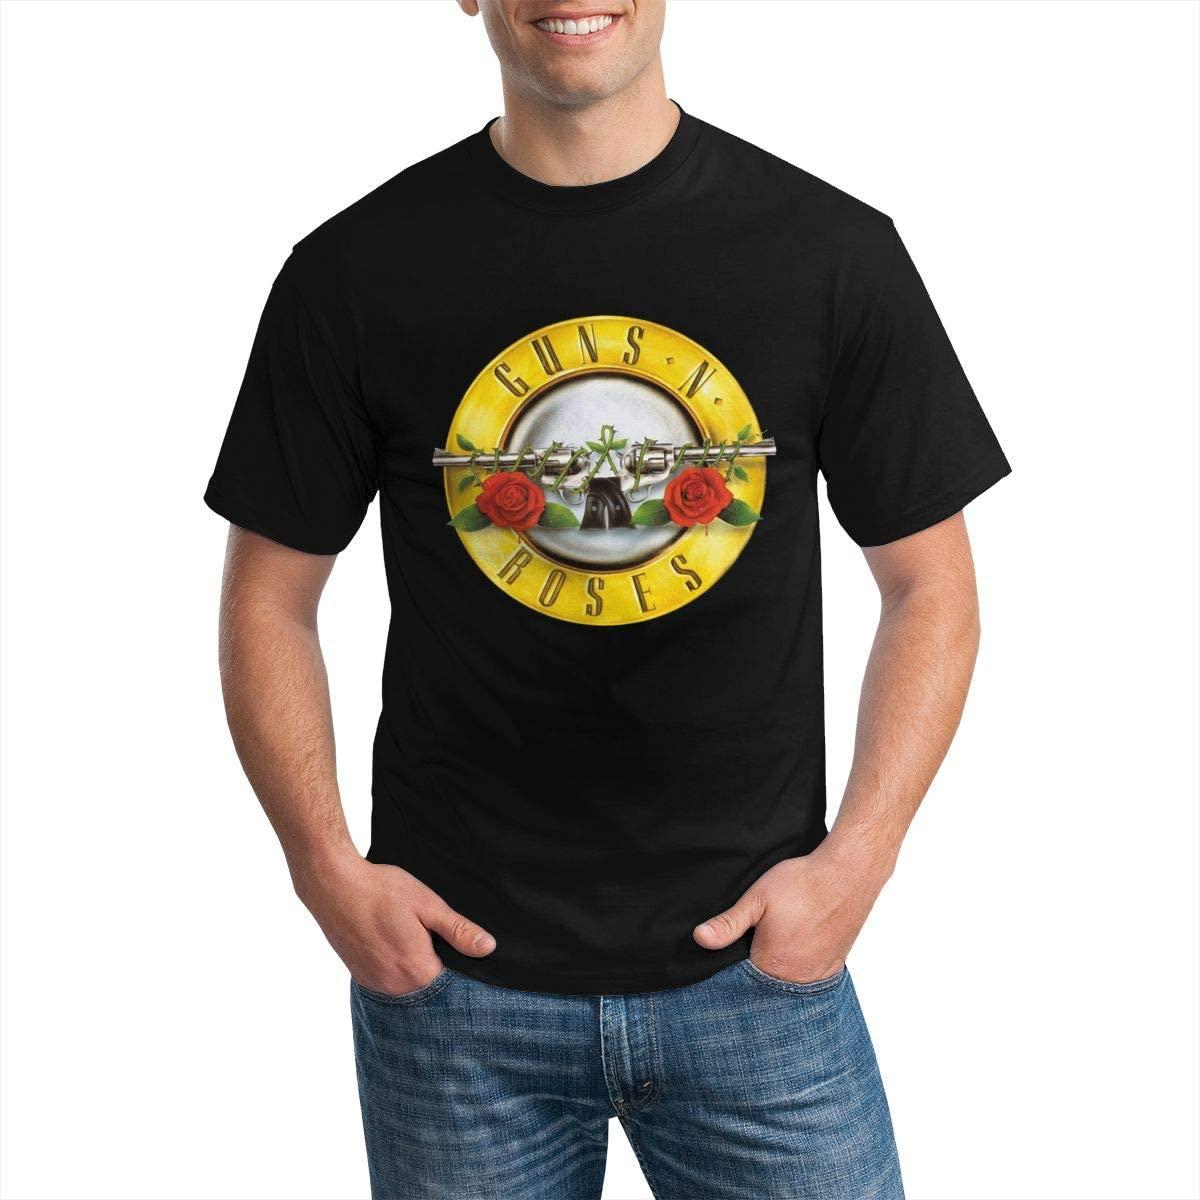 Bravado- Men's Guns N' Roses Classic Bullet Logo Round Neck T-Shirt